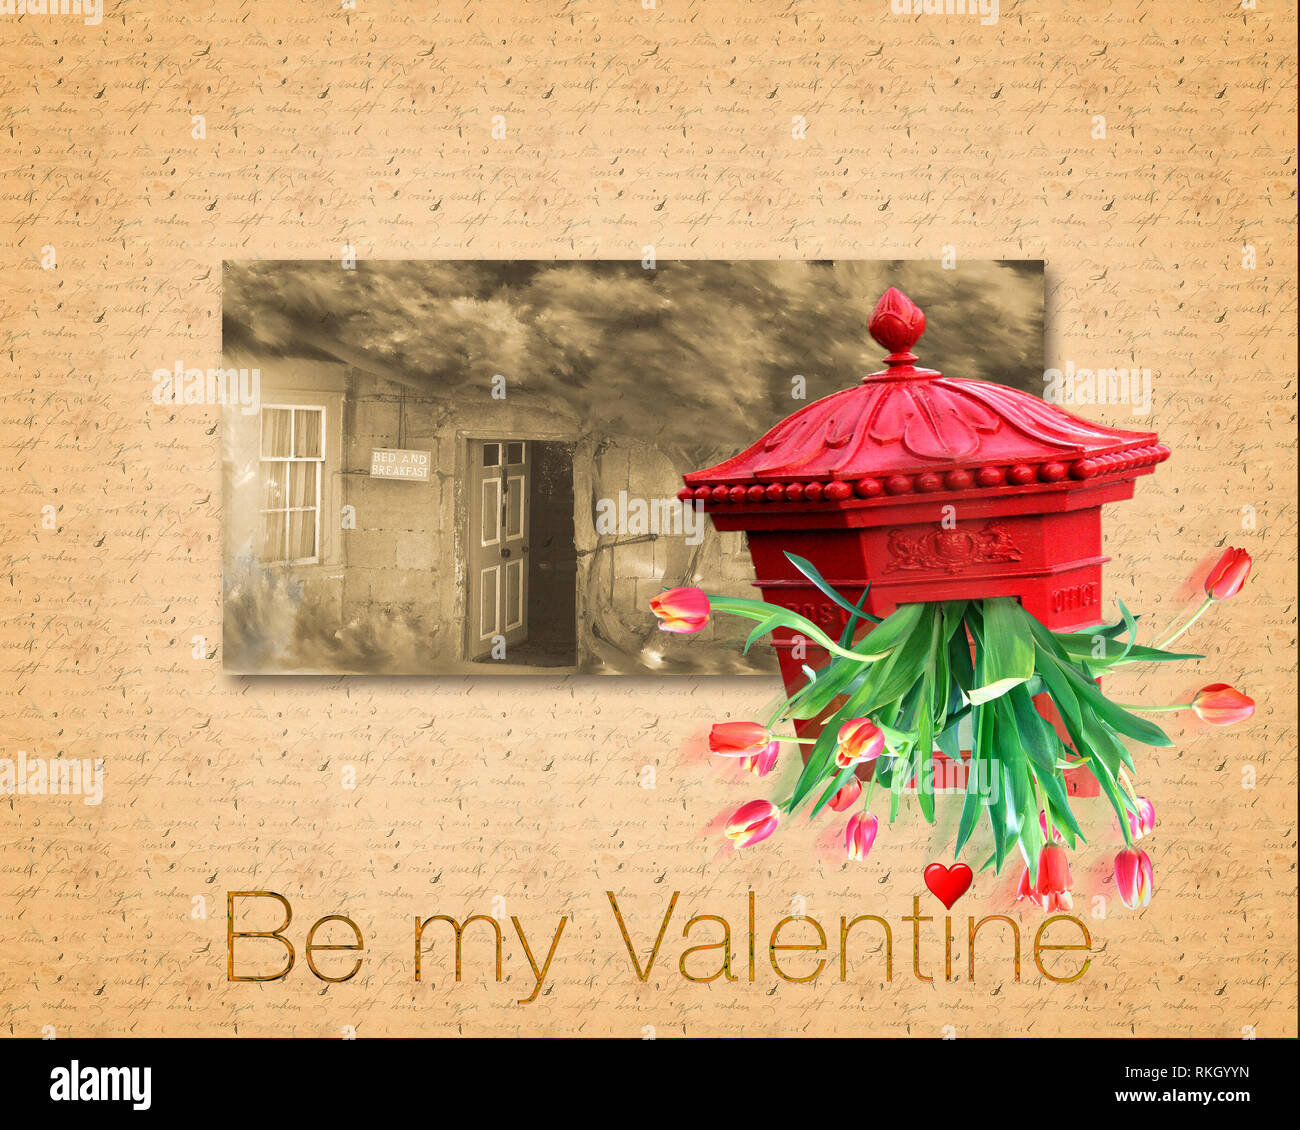 Digitale Kunst: Valentine's Card Design Stockbild